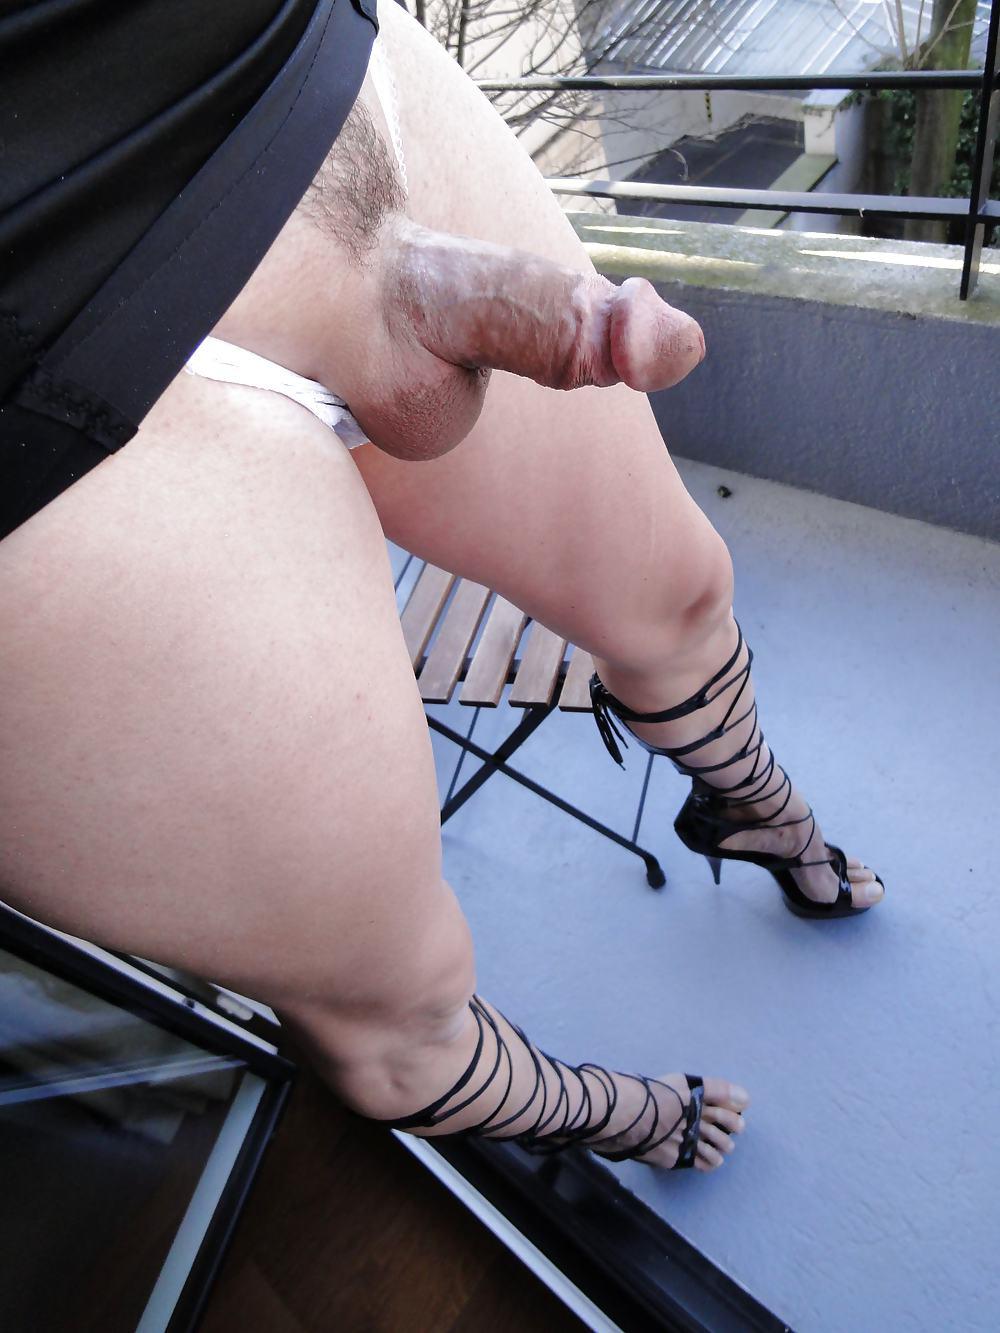 Ass!! Big Beautiful My Baby's